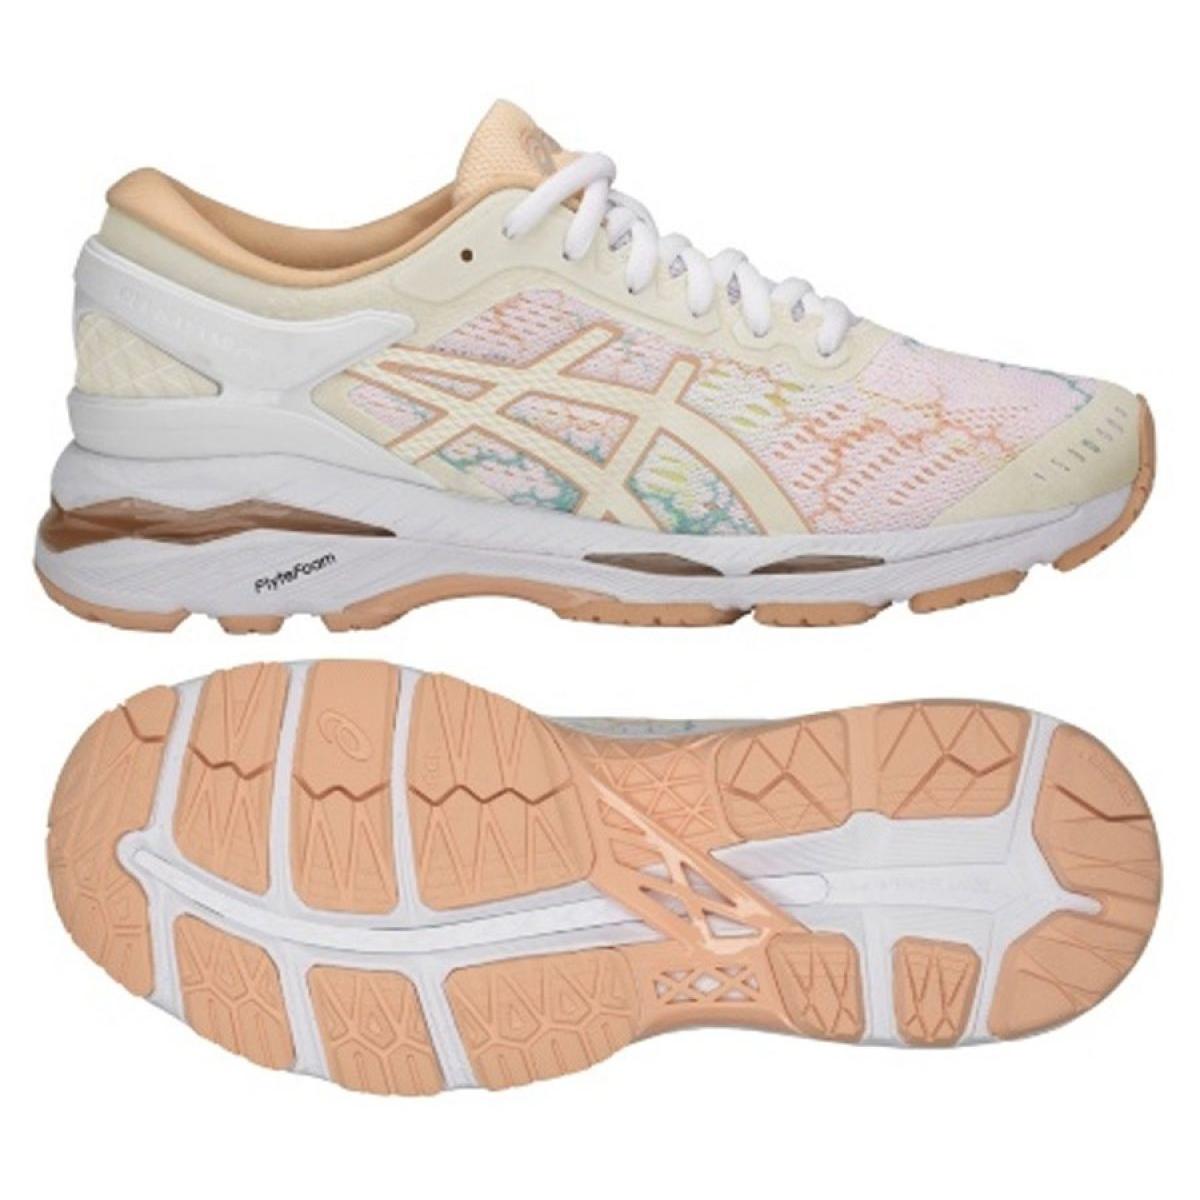 6fe04190 Running shoes Asics gel Kayano 24 Lite Show W T8A9N-0101